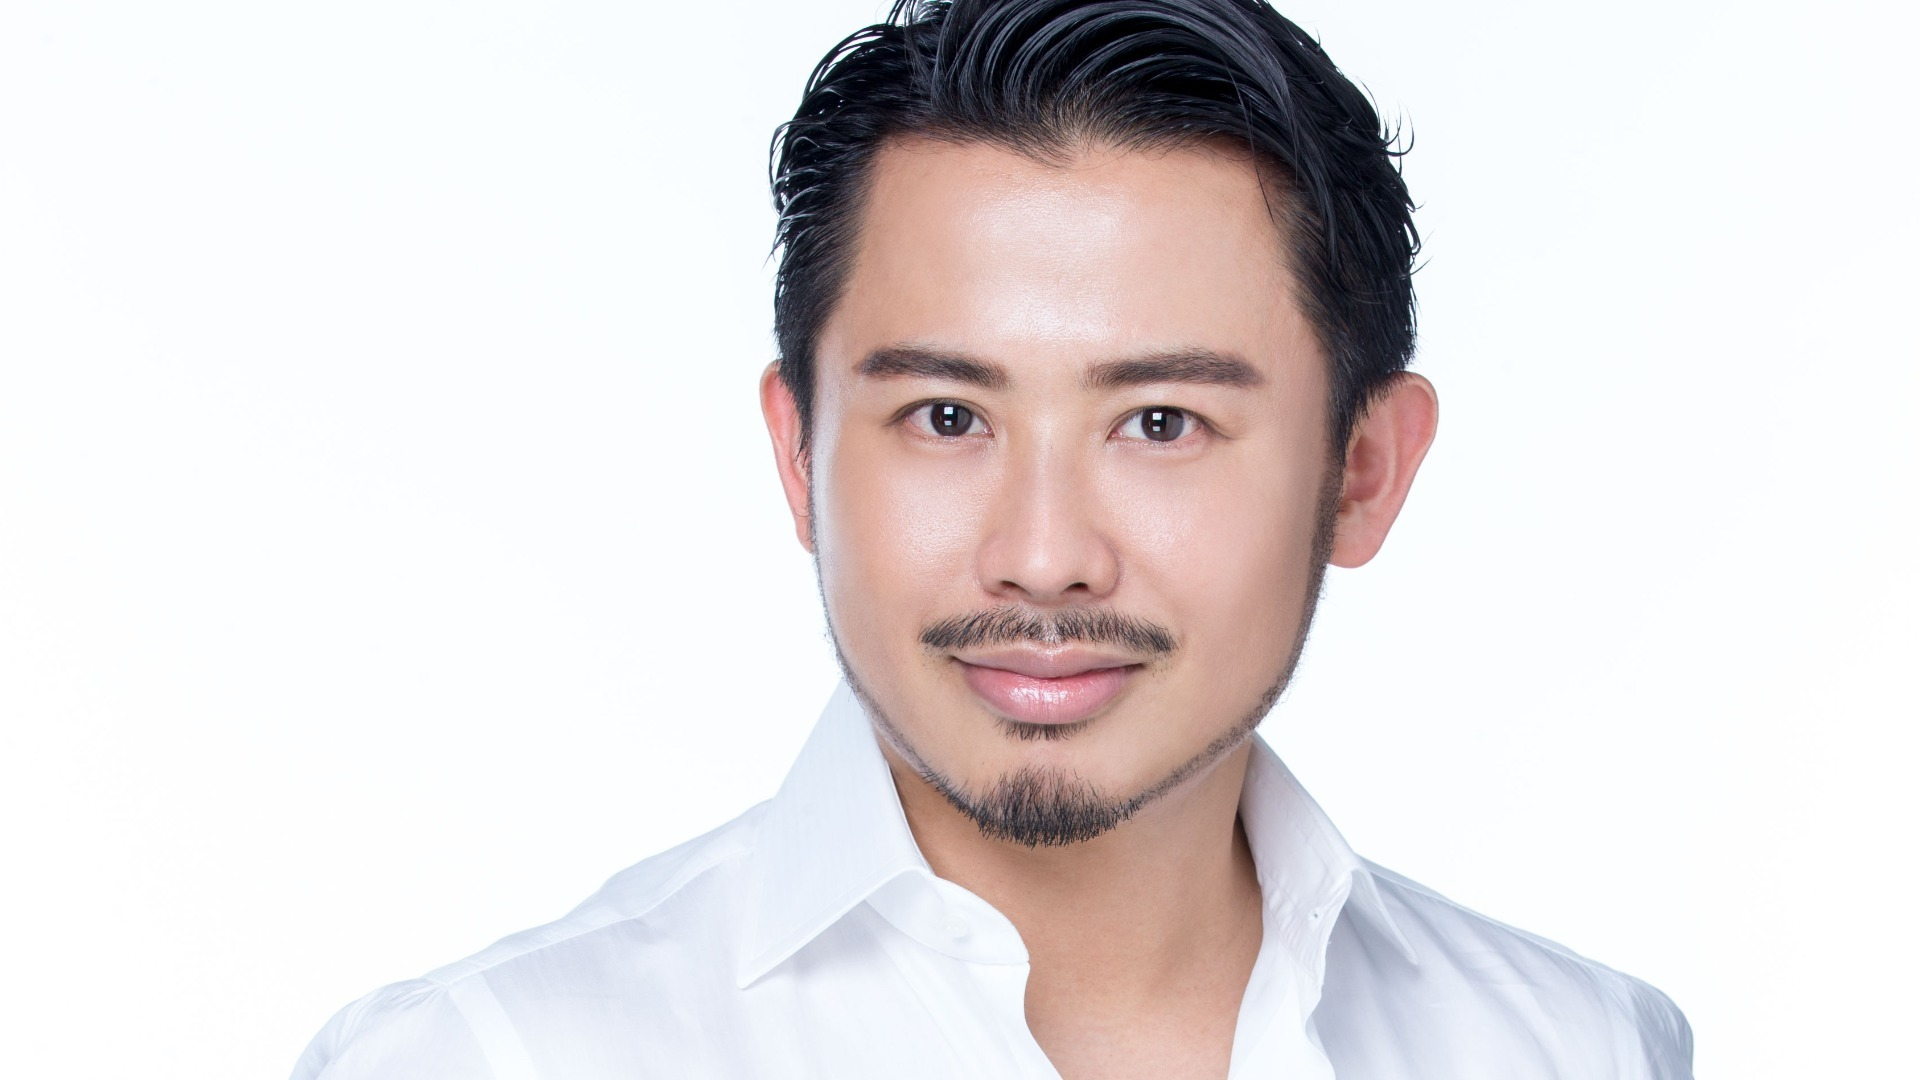 小田切ヒロ | Hiro Odagiri